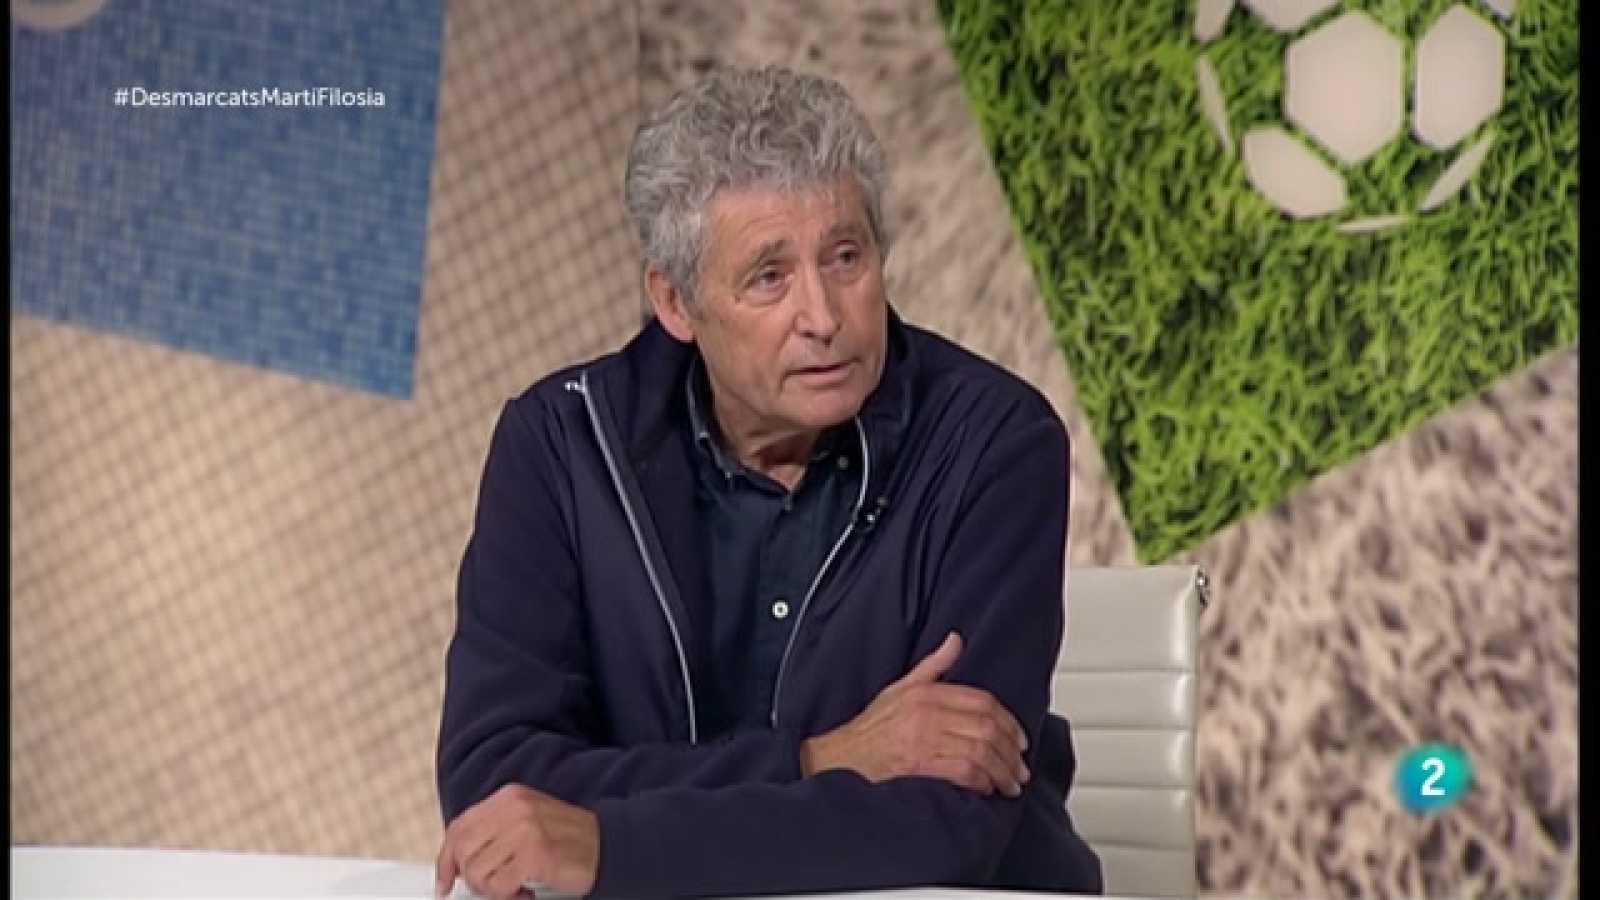 Desmarcats - Narcís Martí Filosia, exfutbolista